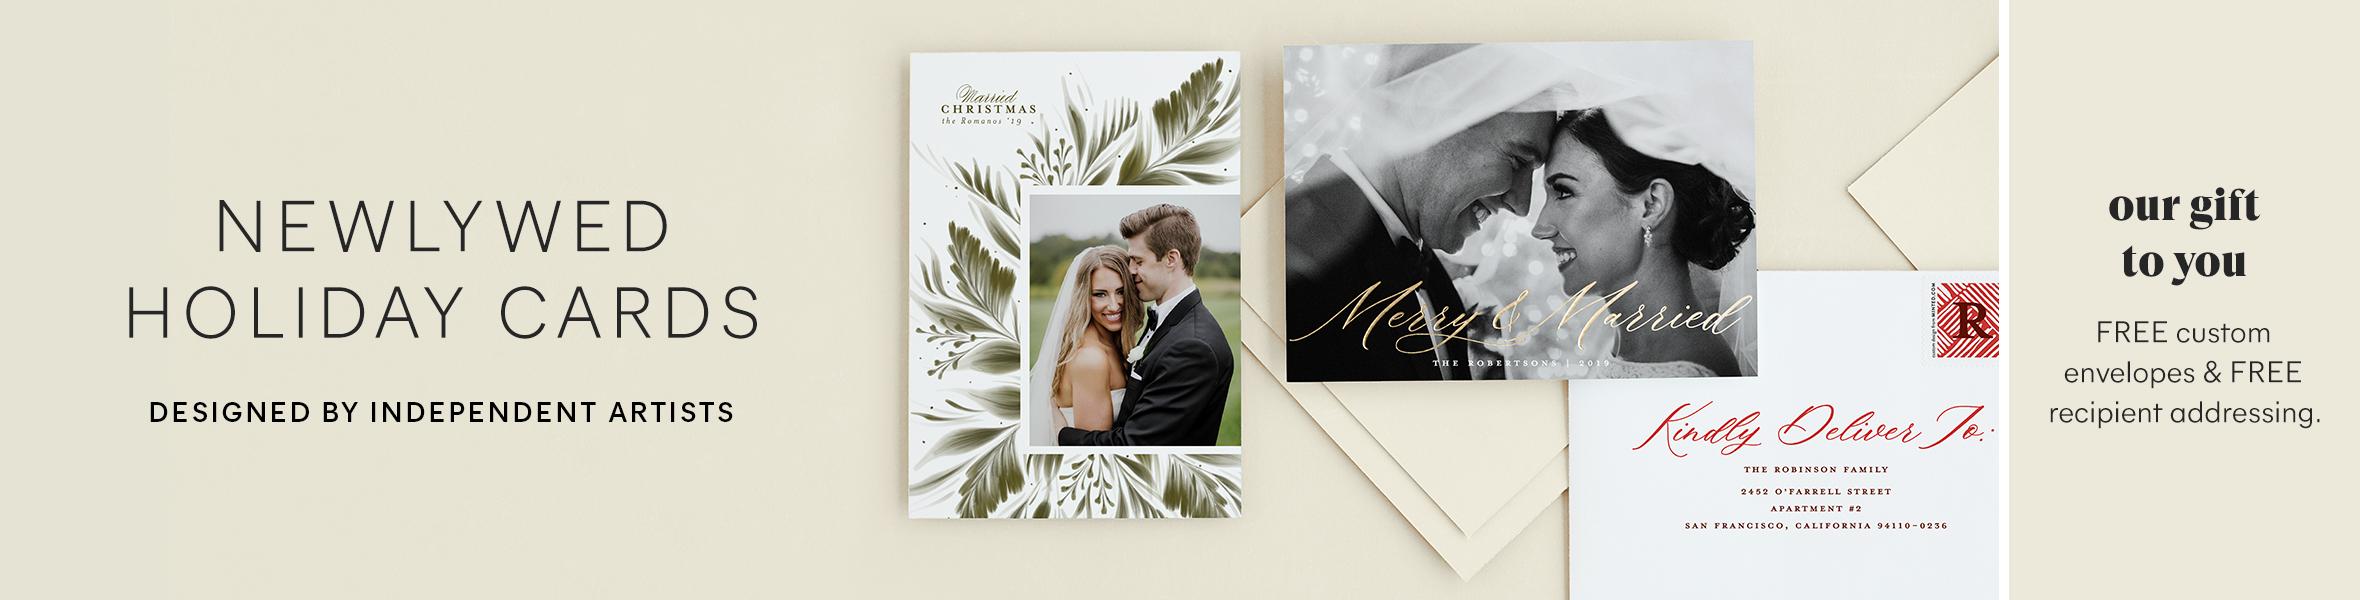 Wedding Holiday Cards